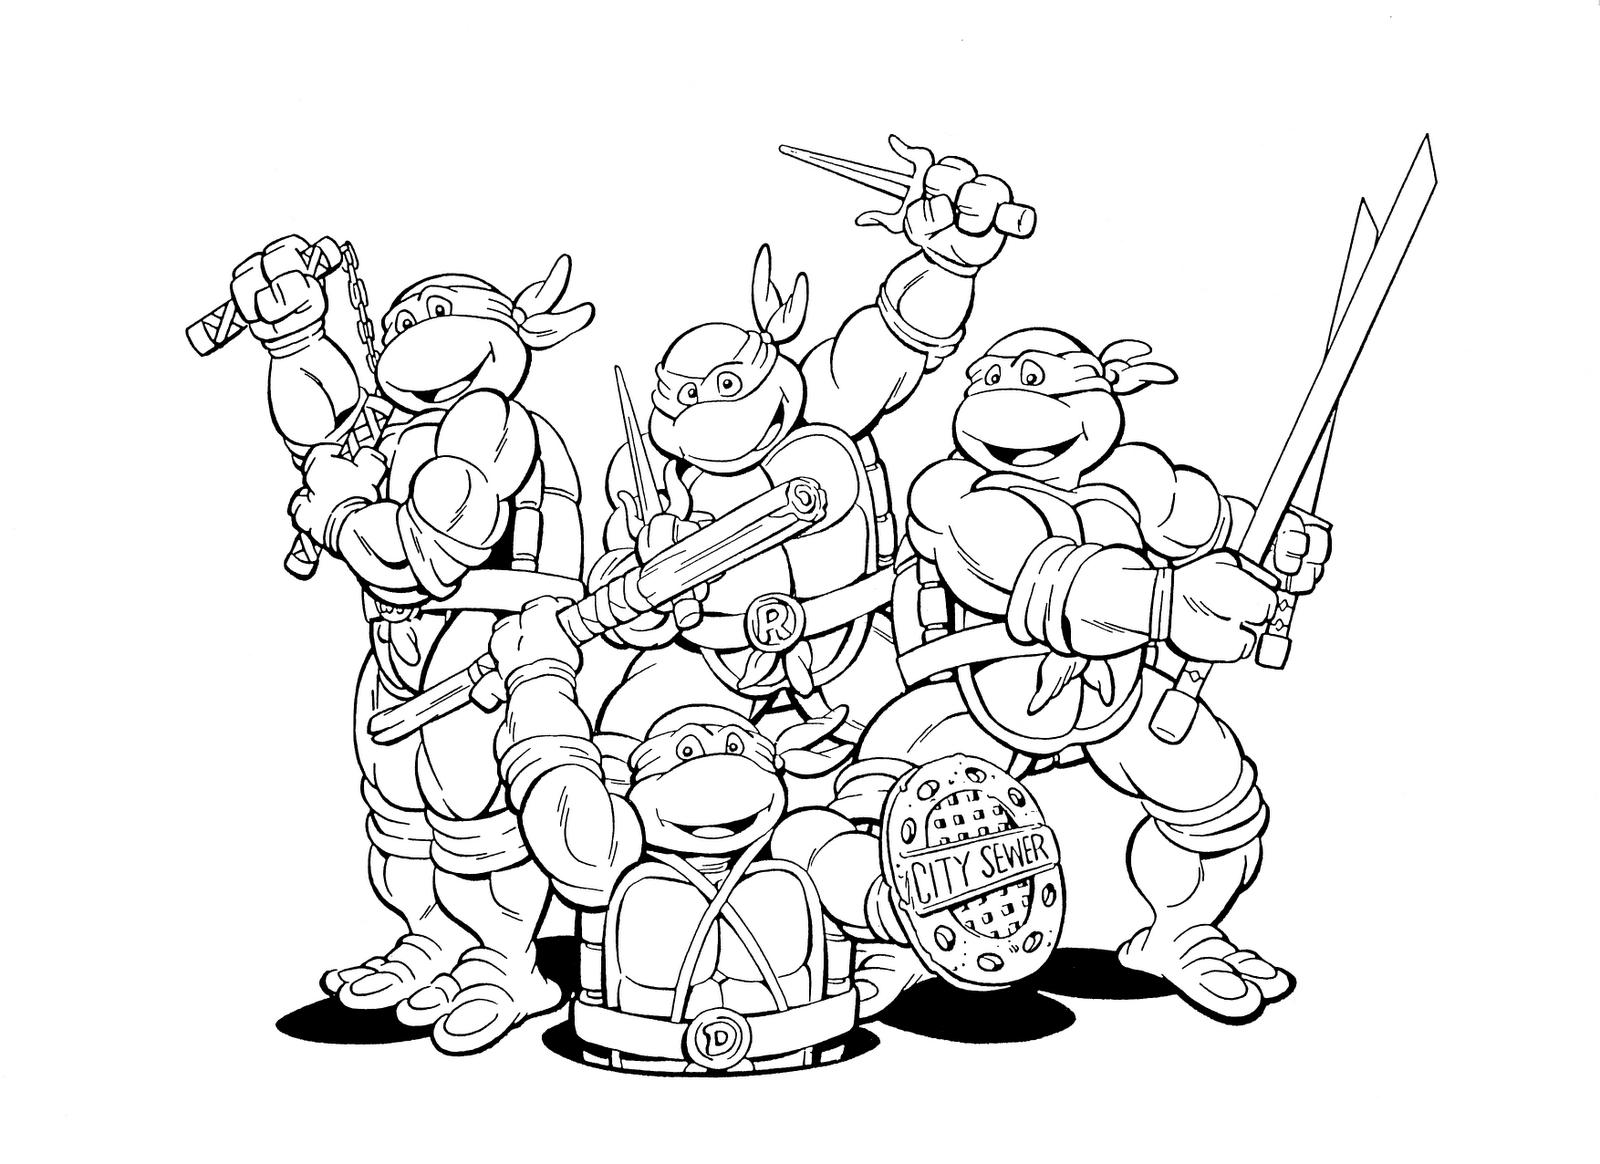 color ninja turtles ninja turtle coloring pages free printable pictures turtles ninja color